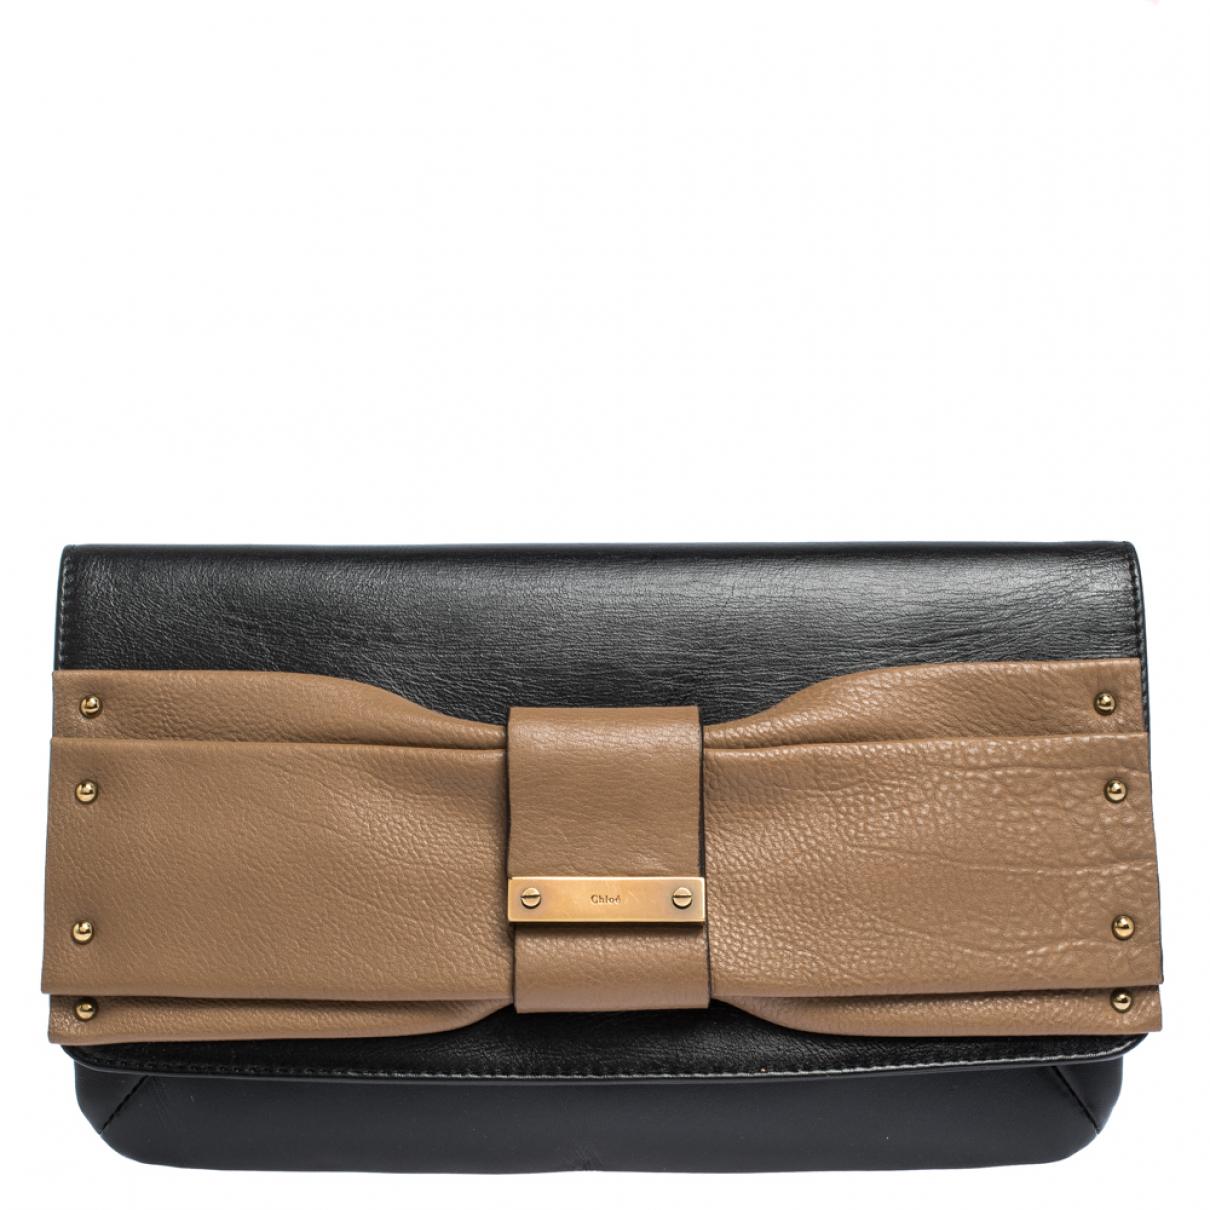 Chloé \N Black Leather Clutch bag for Women \N